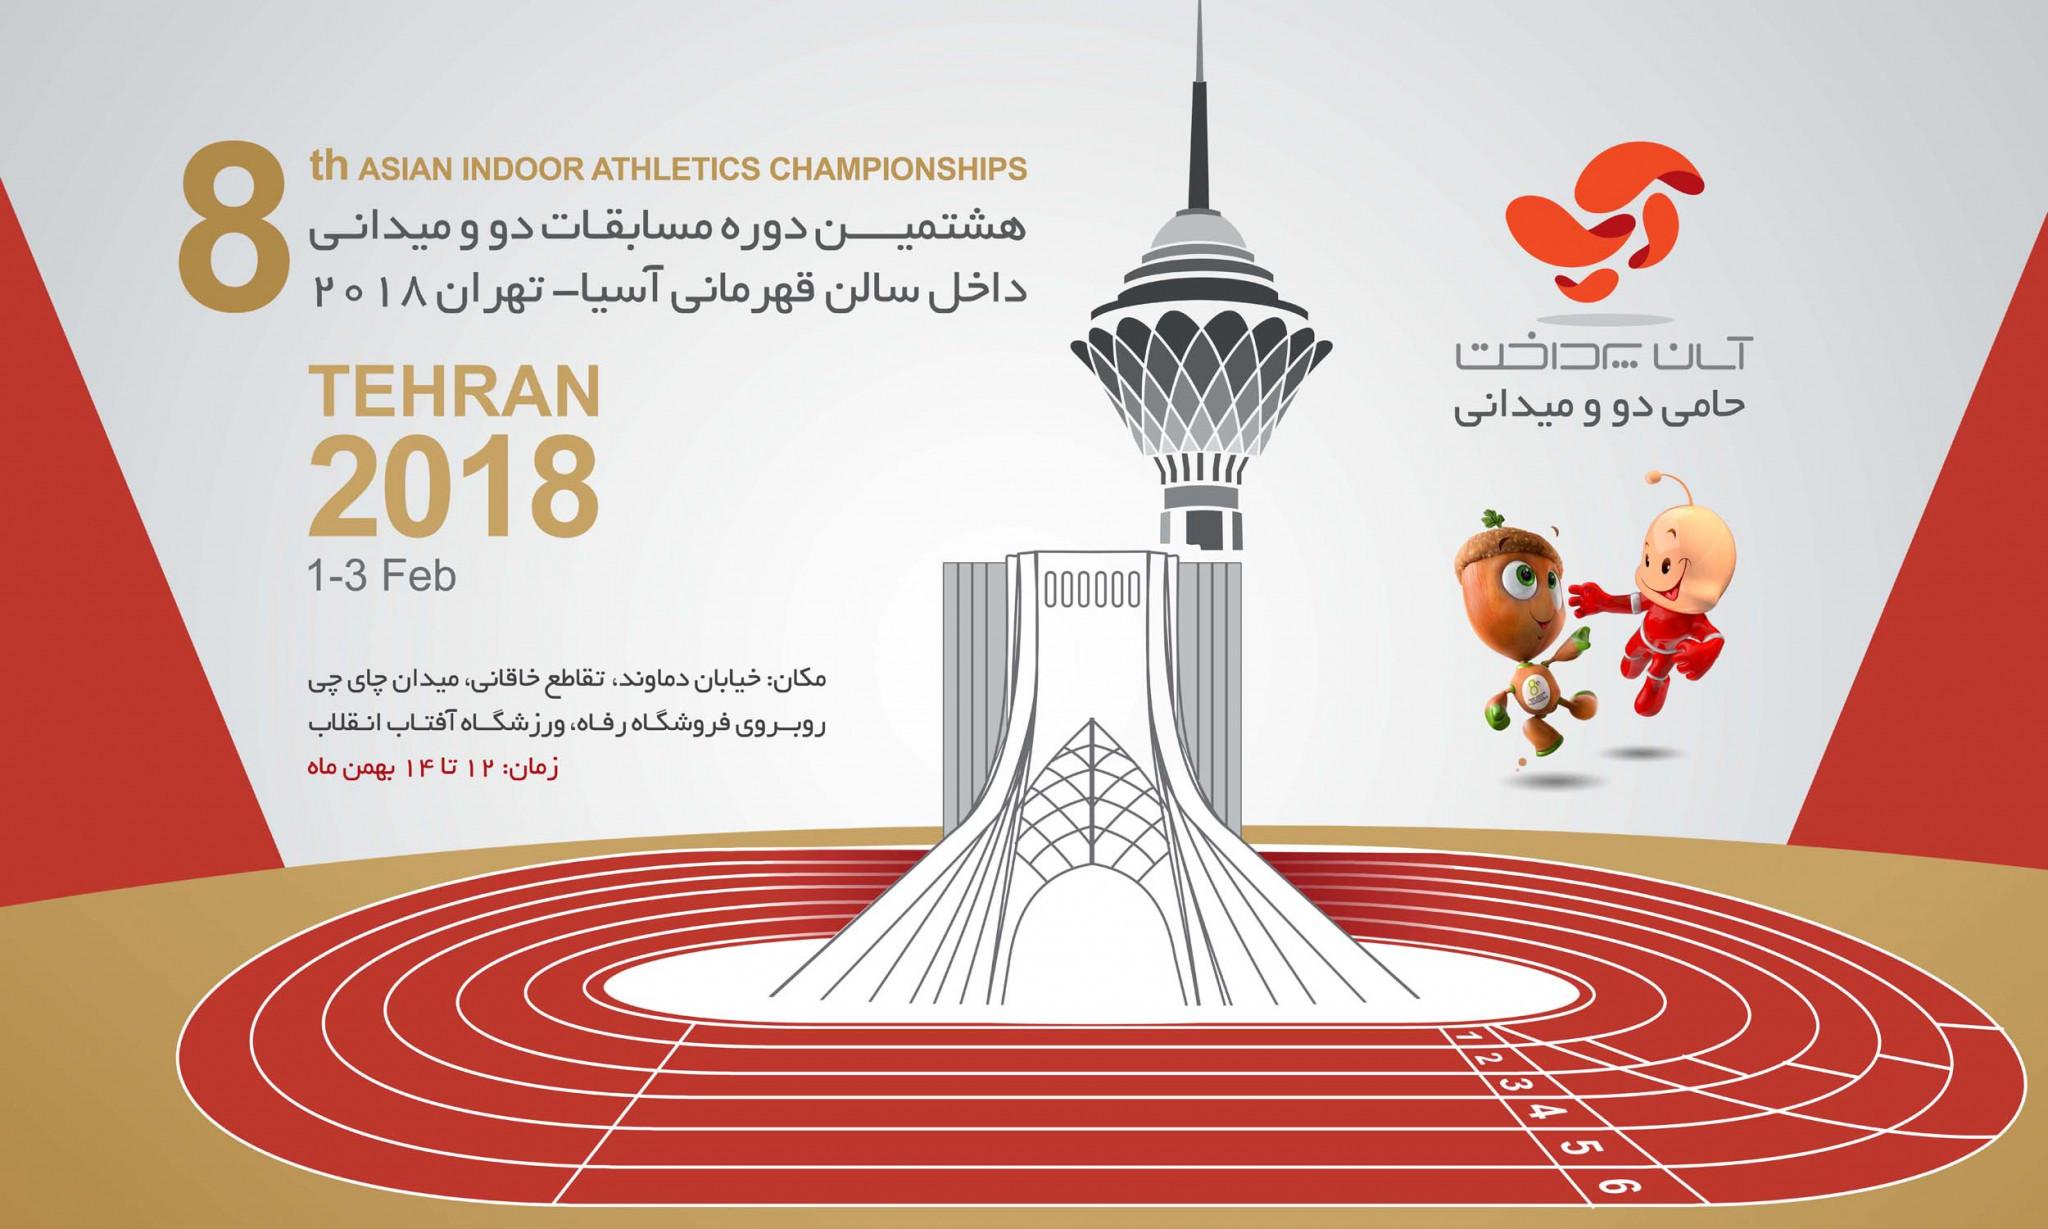 Barshim the star name as Tehran hosts Asian Indoor Athletics Championships